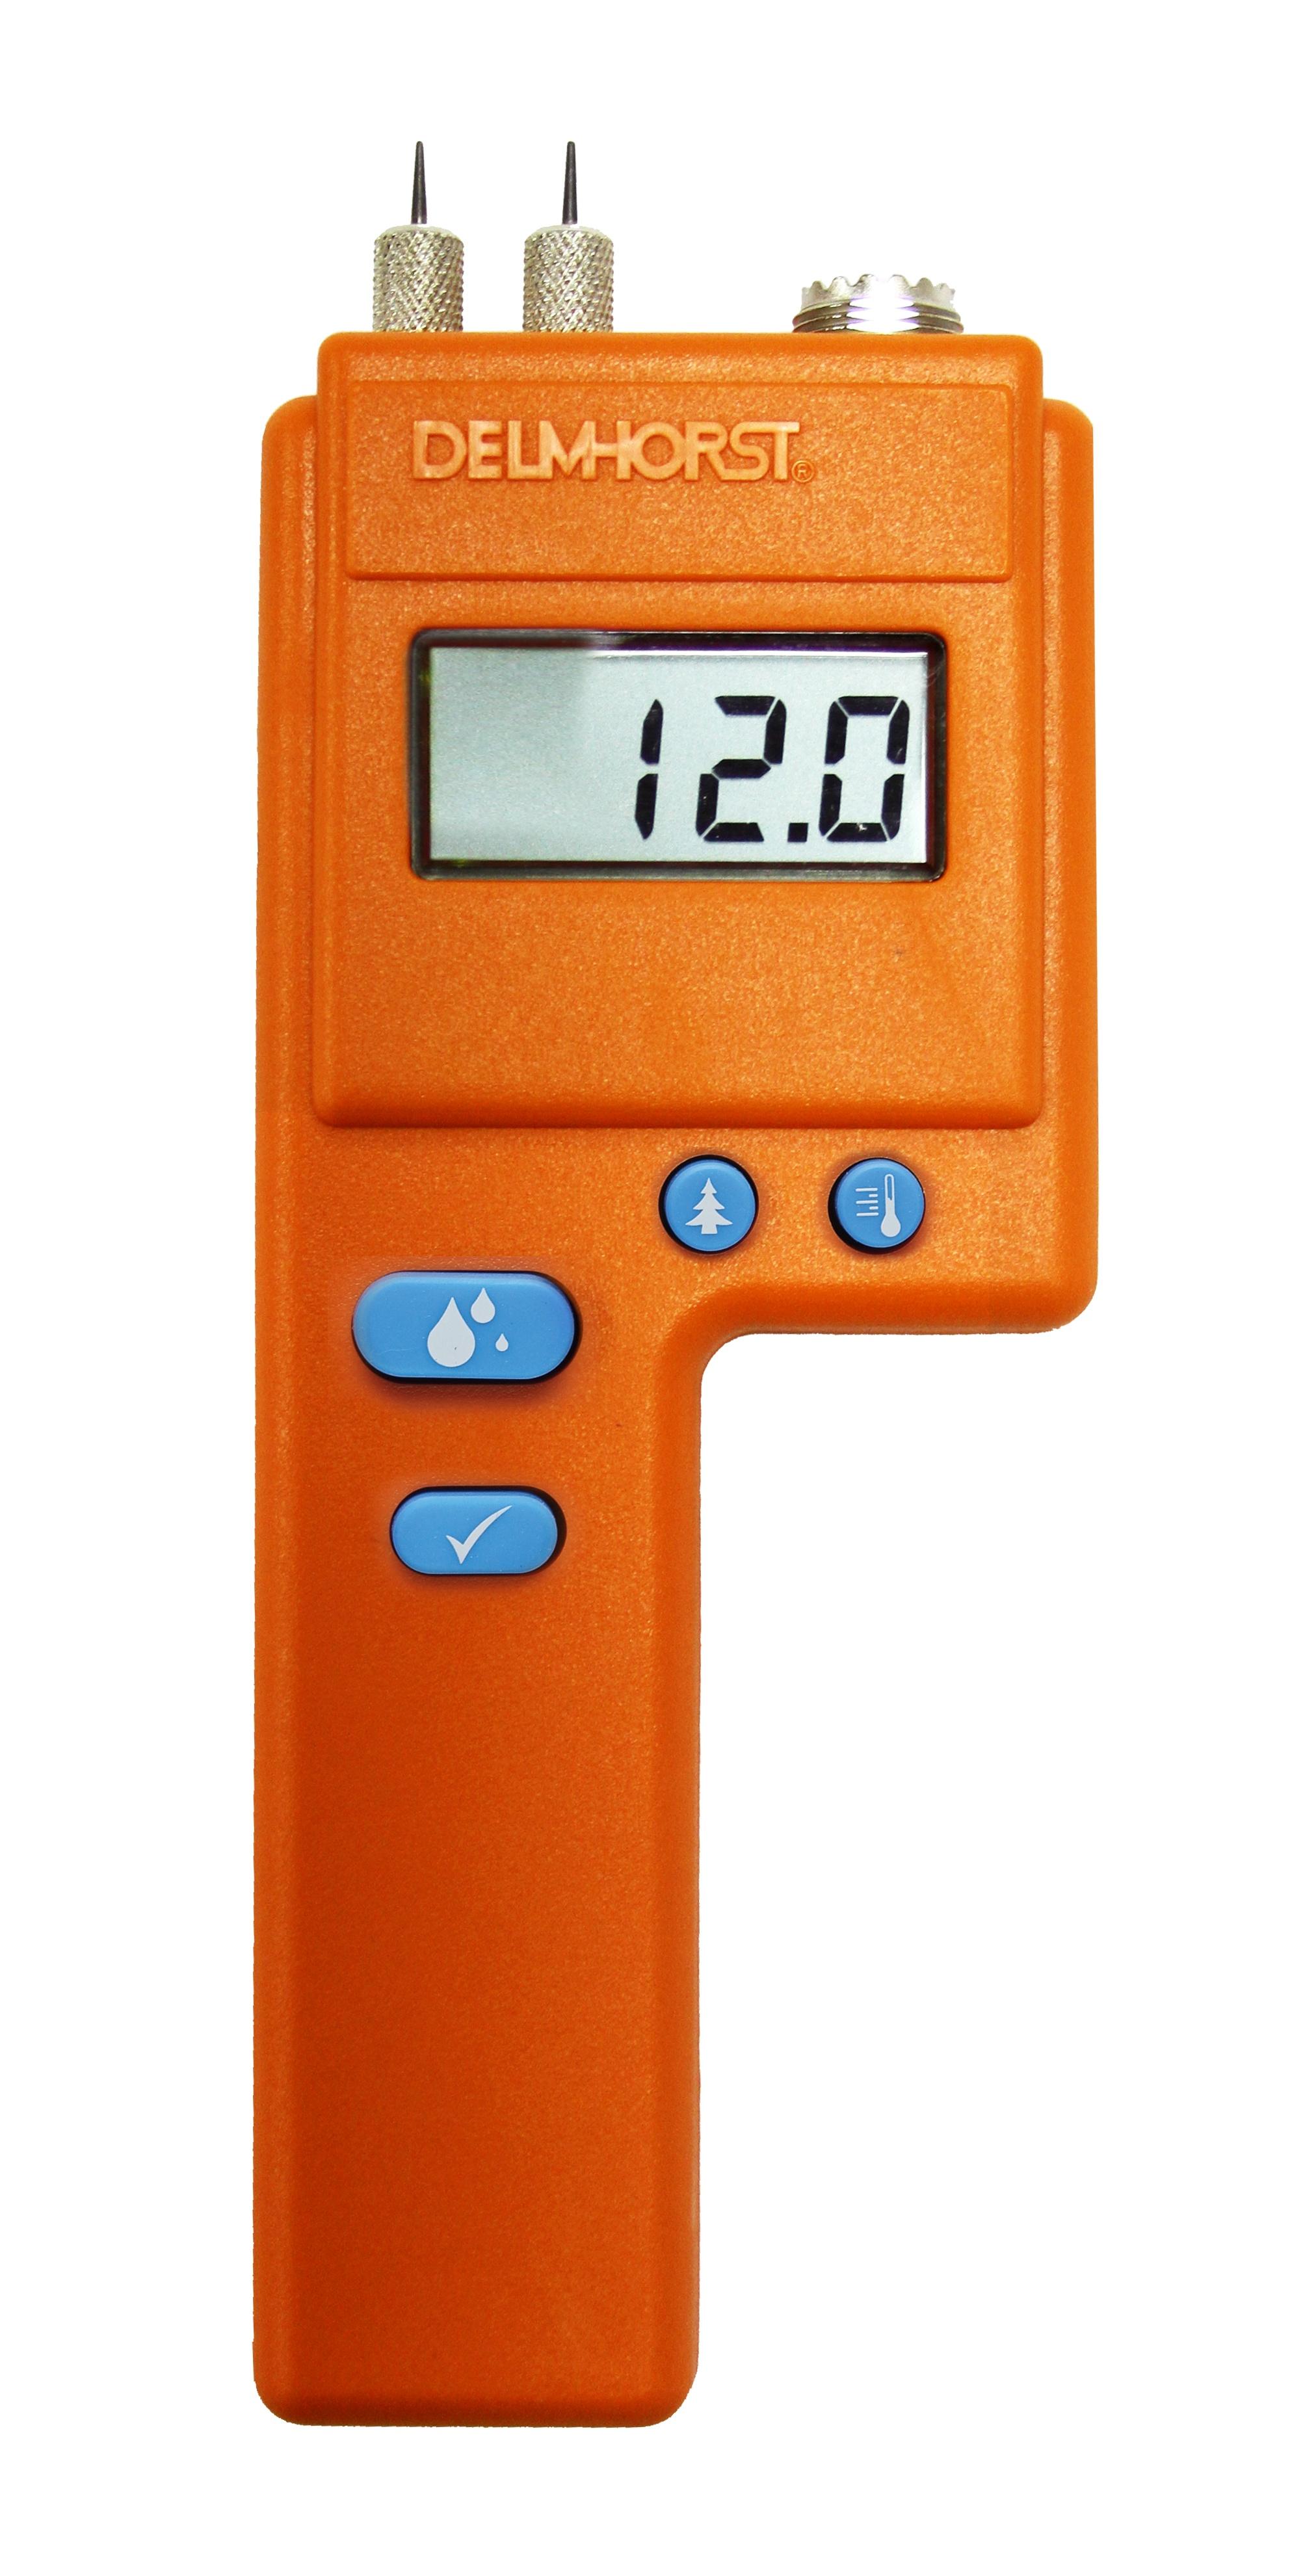 J-2000 moisture meter